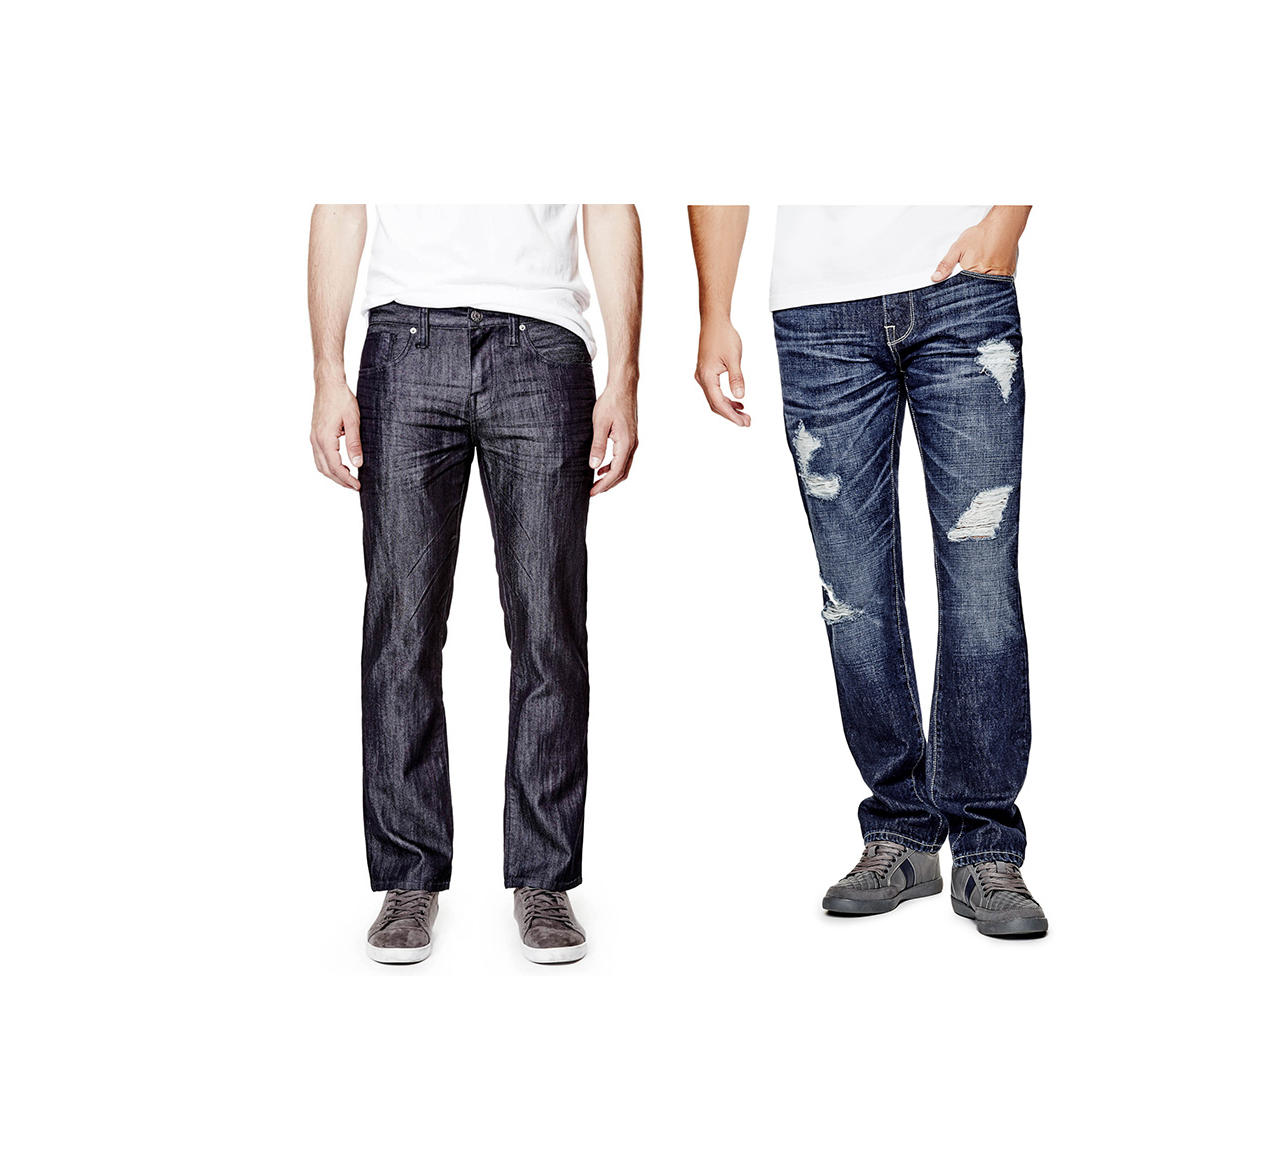 Men's Denim Fit Guide | GUESS Factory